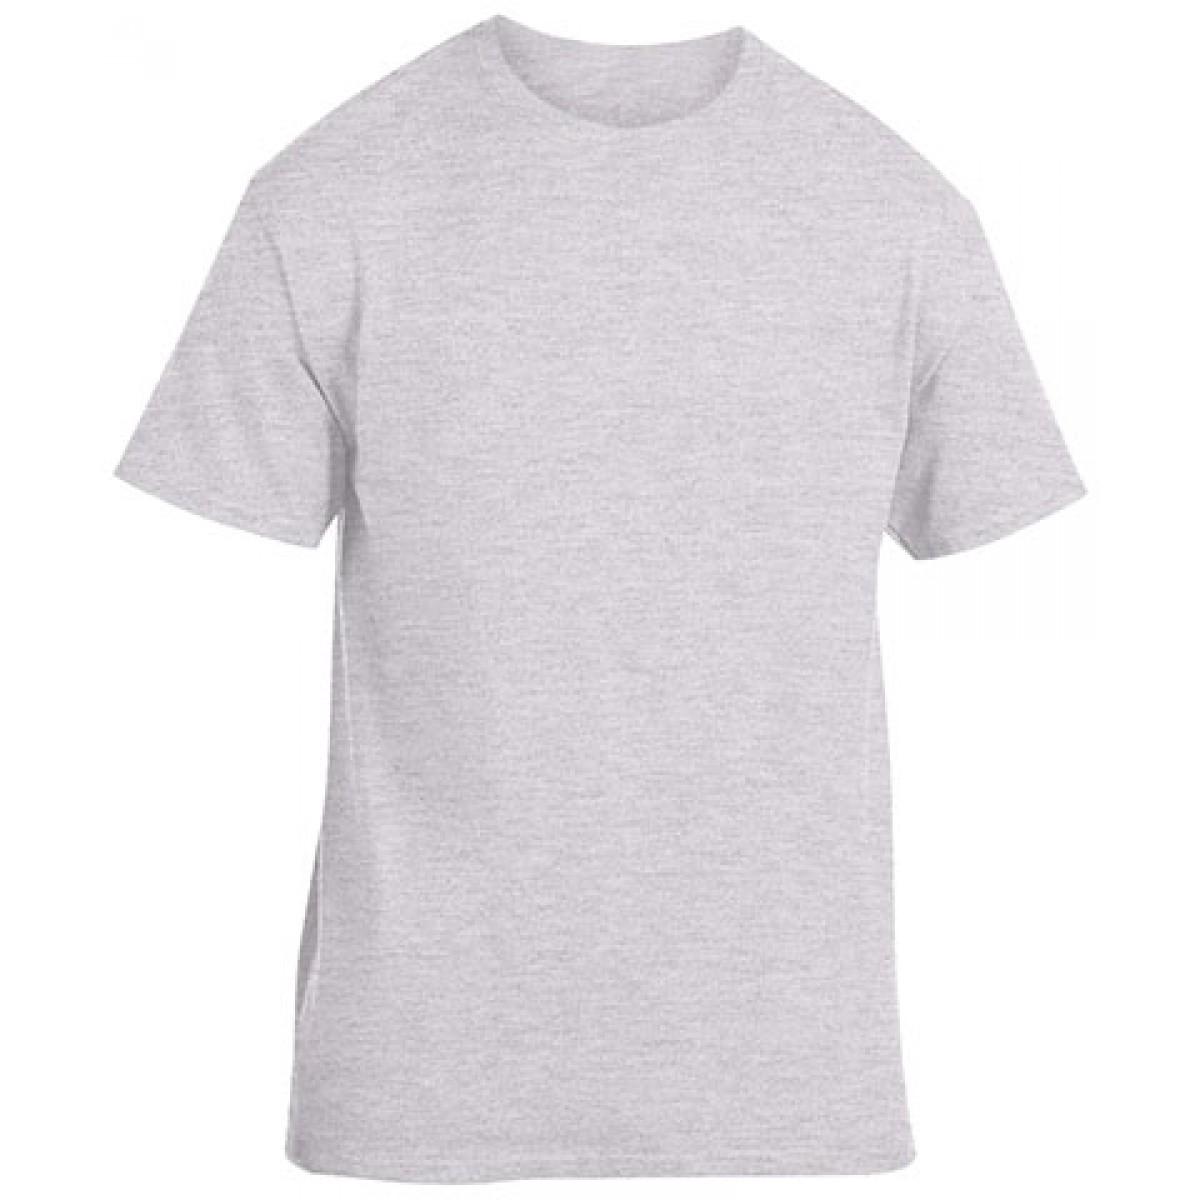 Cotton Short Sleeve T-Shirt-Sports Grey-S